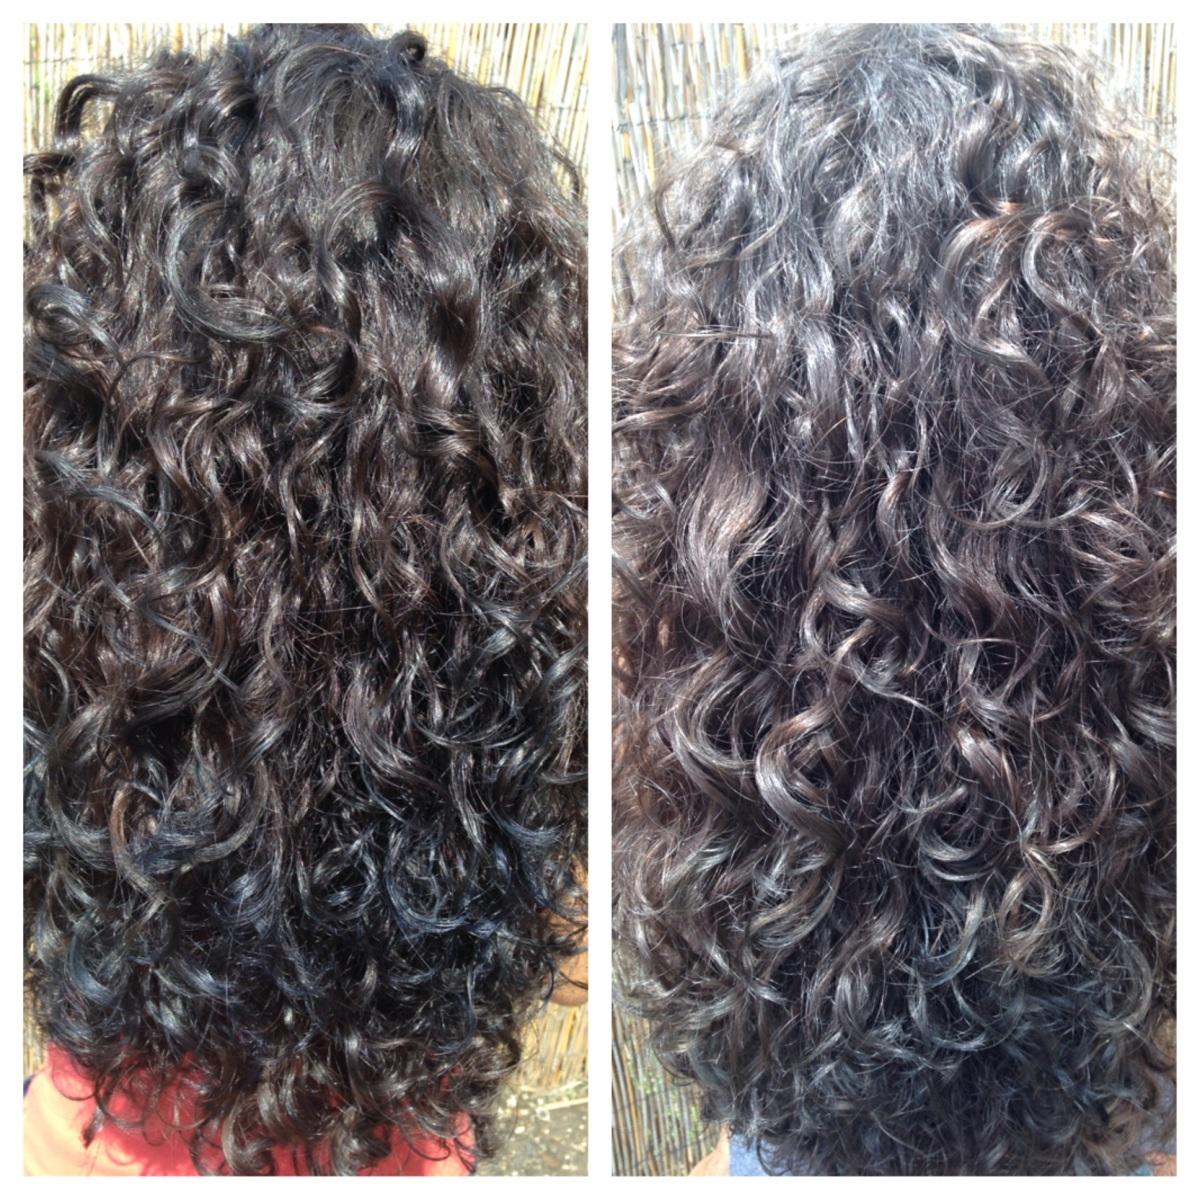 The Vitamin C Method for Removing Demi-Permanent Hair Dye ...